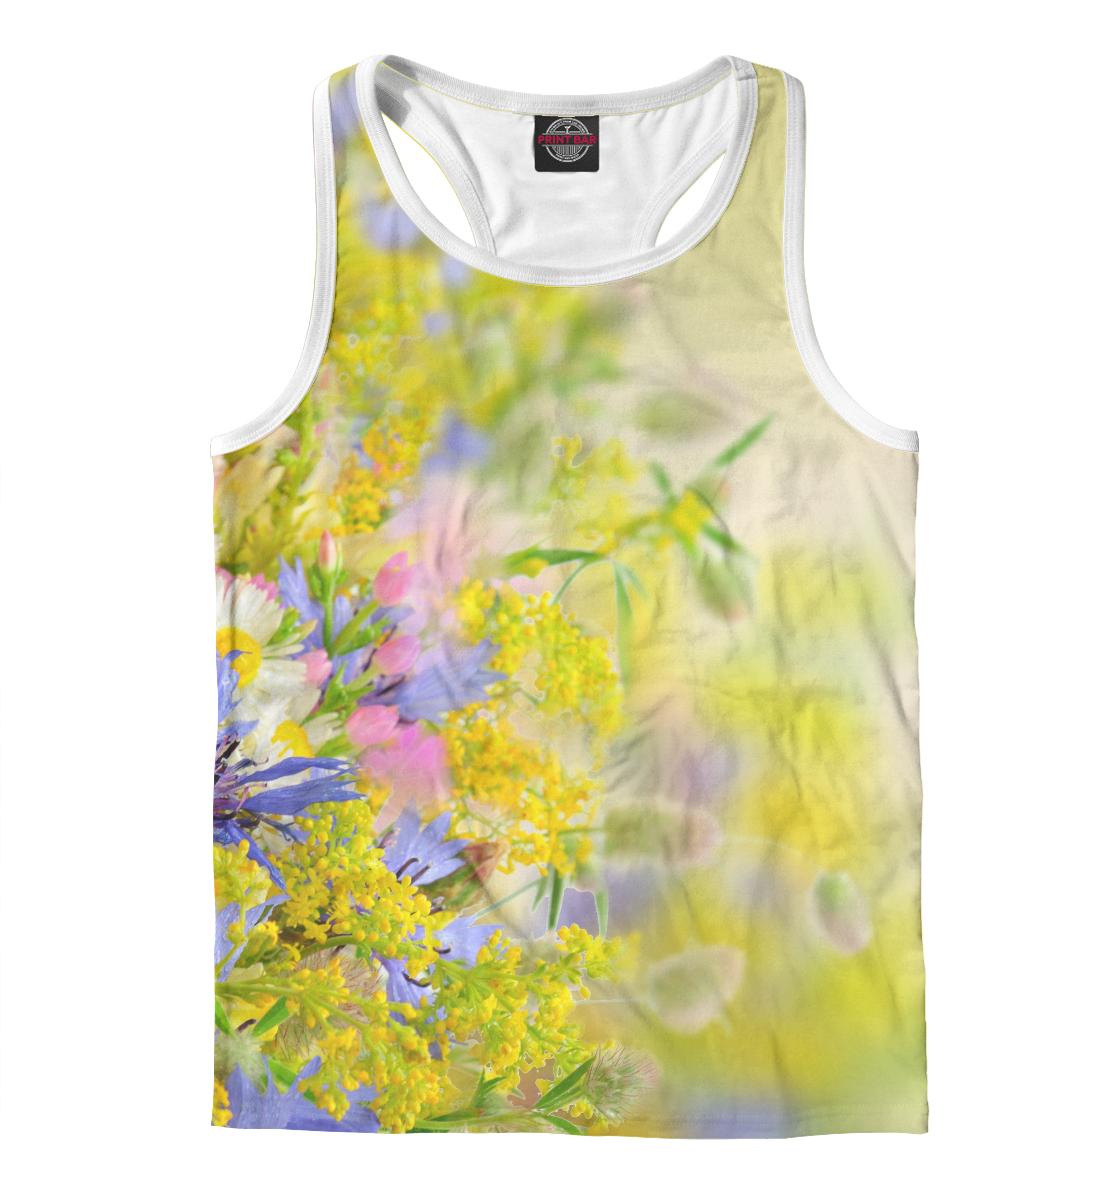 Купить Цветочки, Printbar, Майки борцовки, CVE-406827-mayb-2